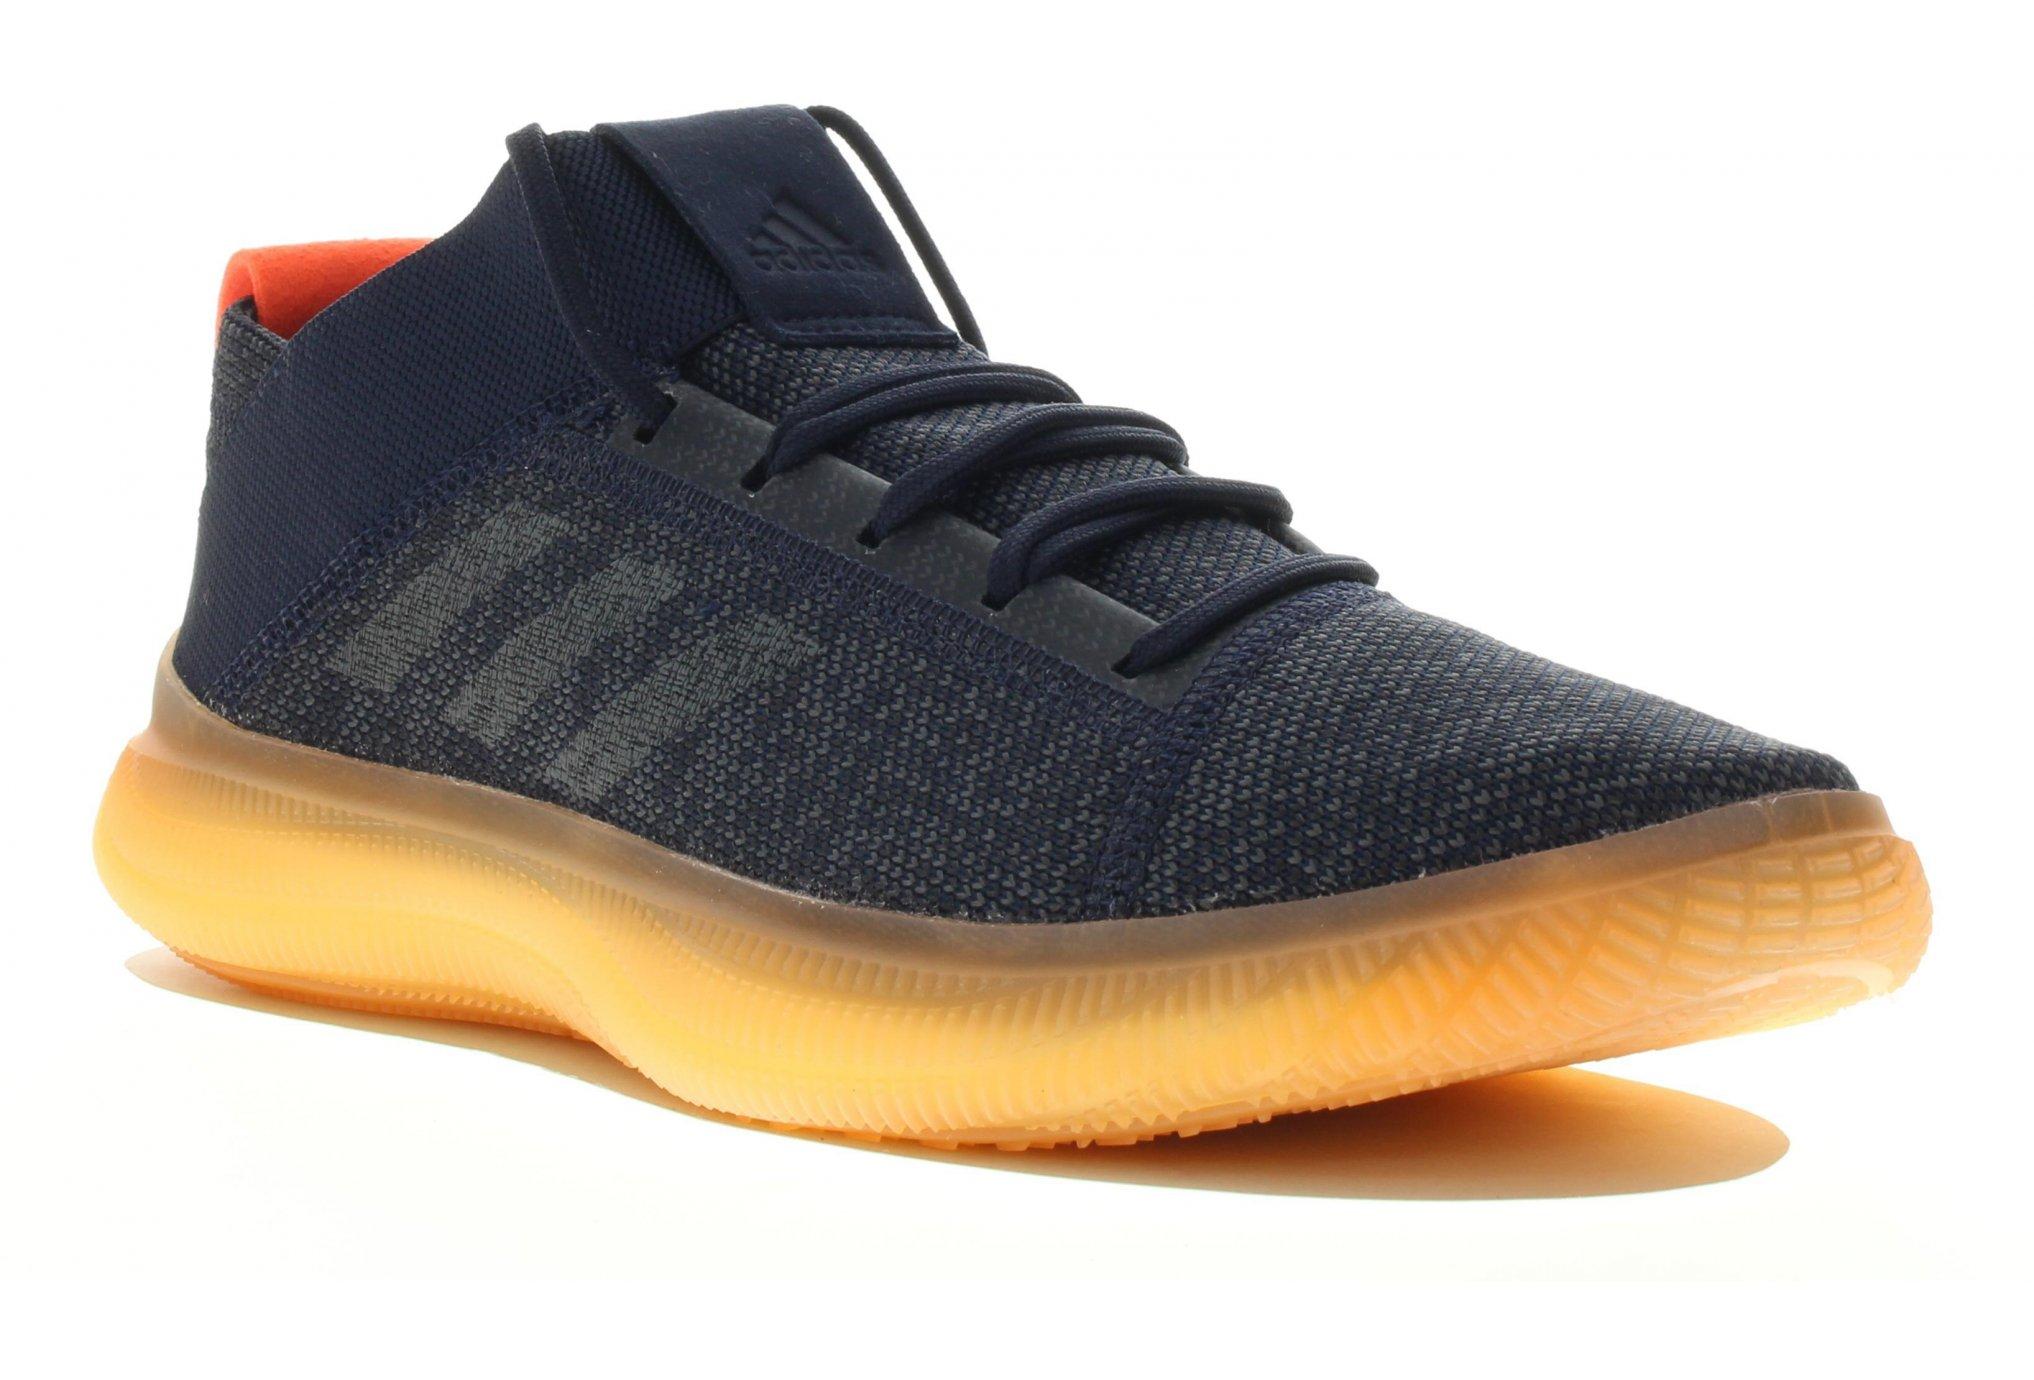 adidas PureBOOST Trainer W Diététique Chaussures femme